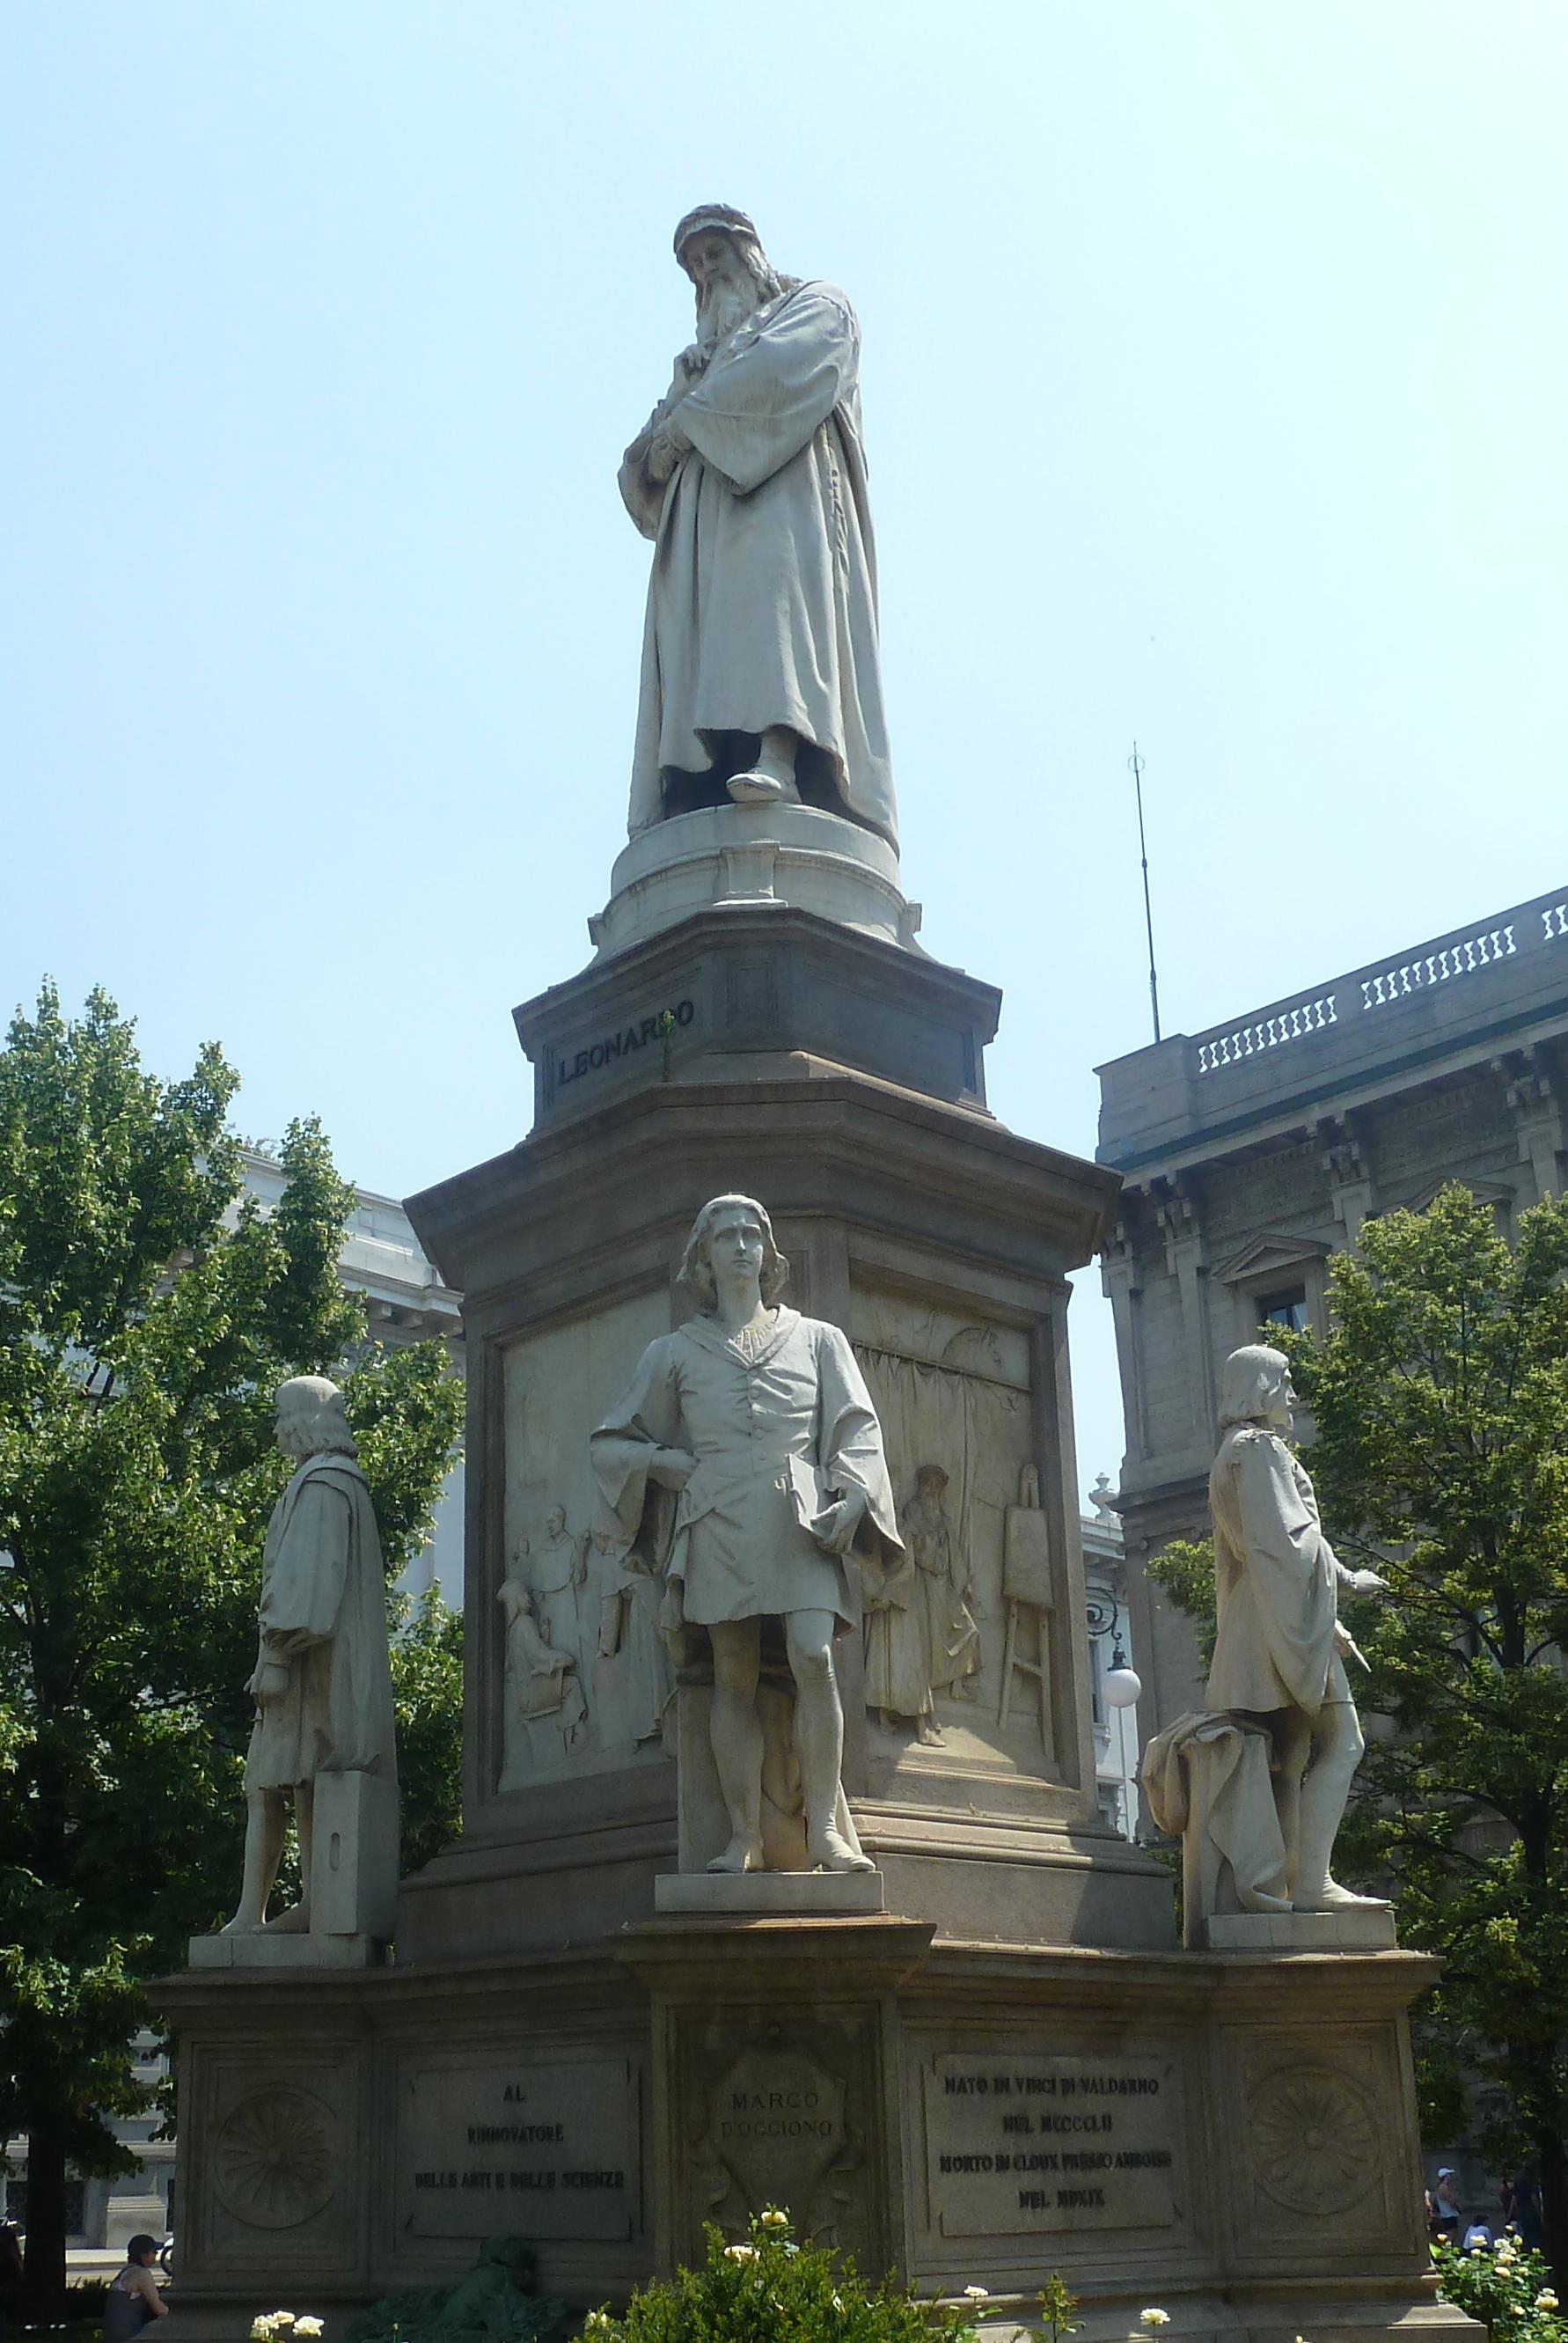 Socha Leonarda DaVinciho, Miláno (foto imriš, 2019)